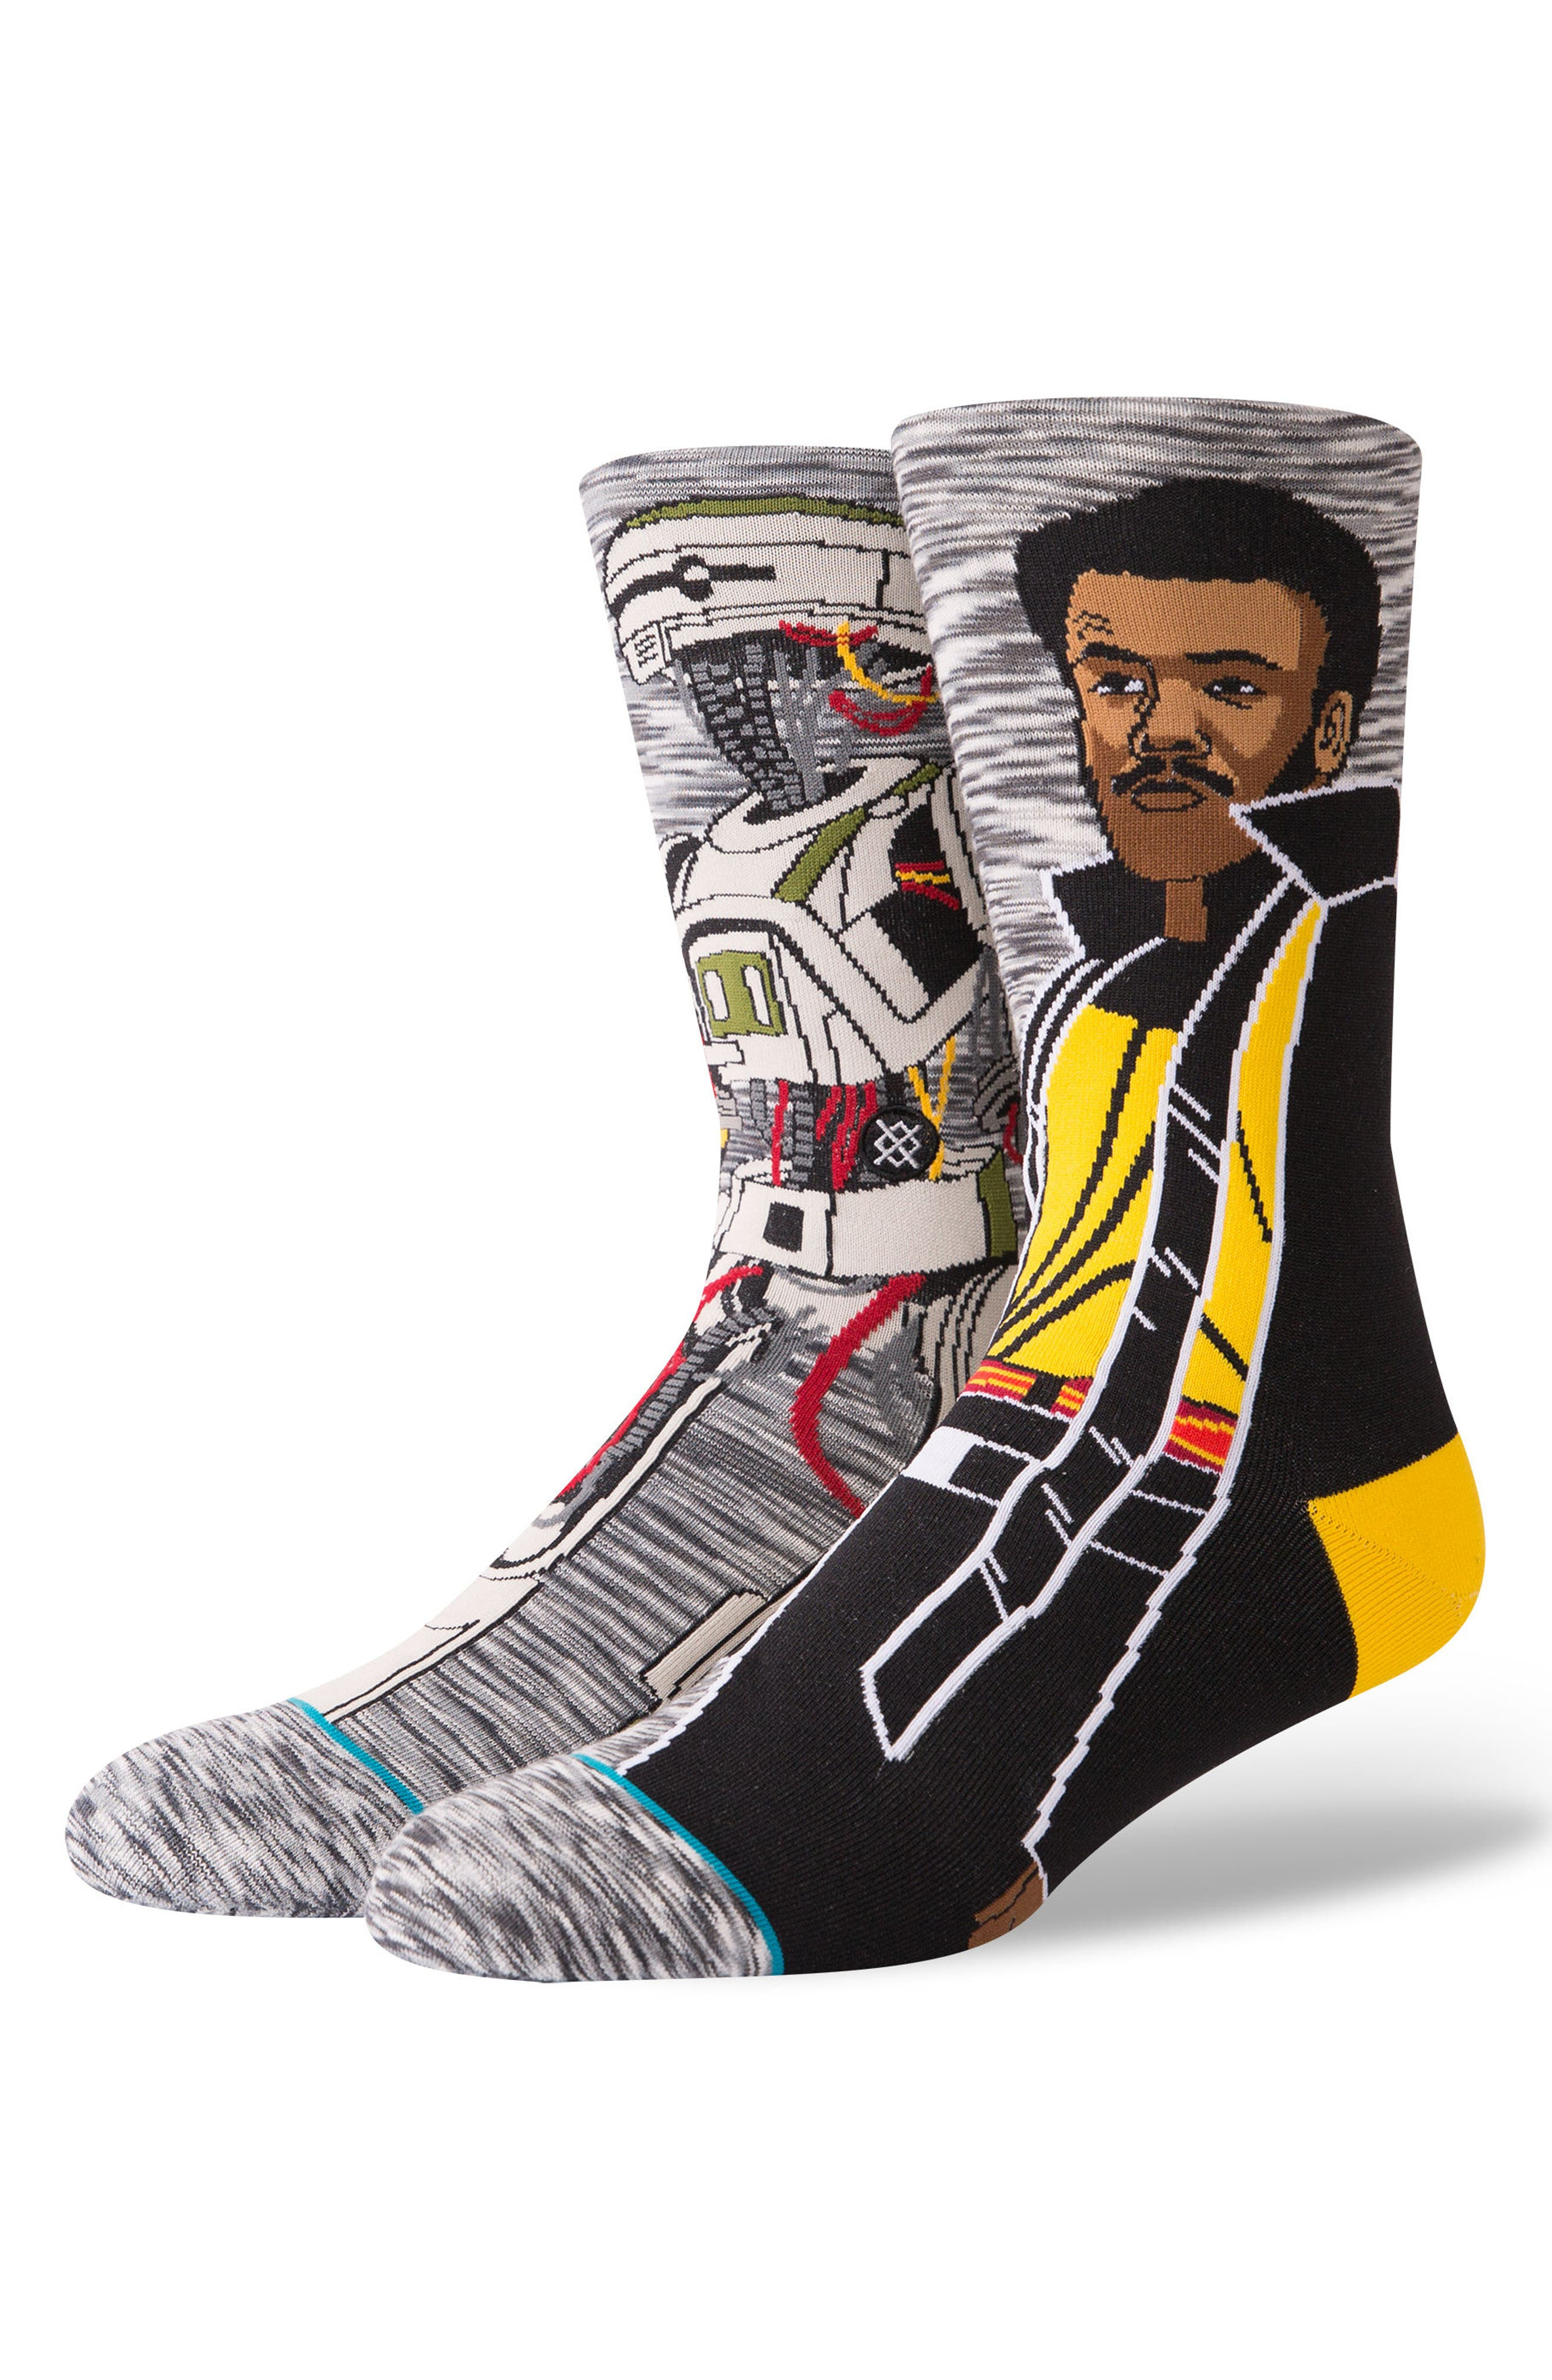 Star Wars Calrissian Socks,                         Main,                         color, Grey